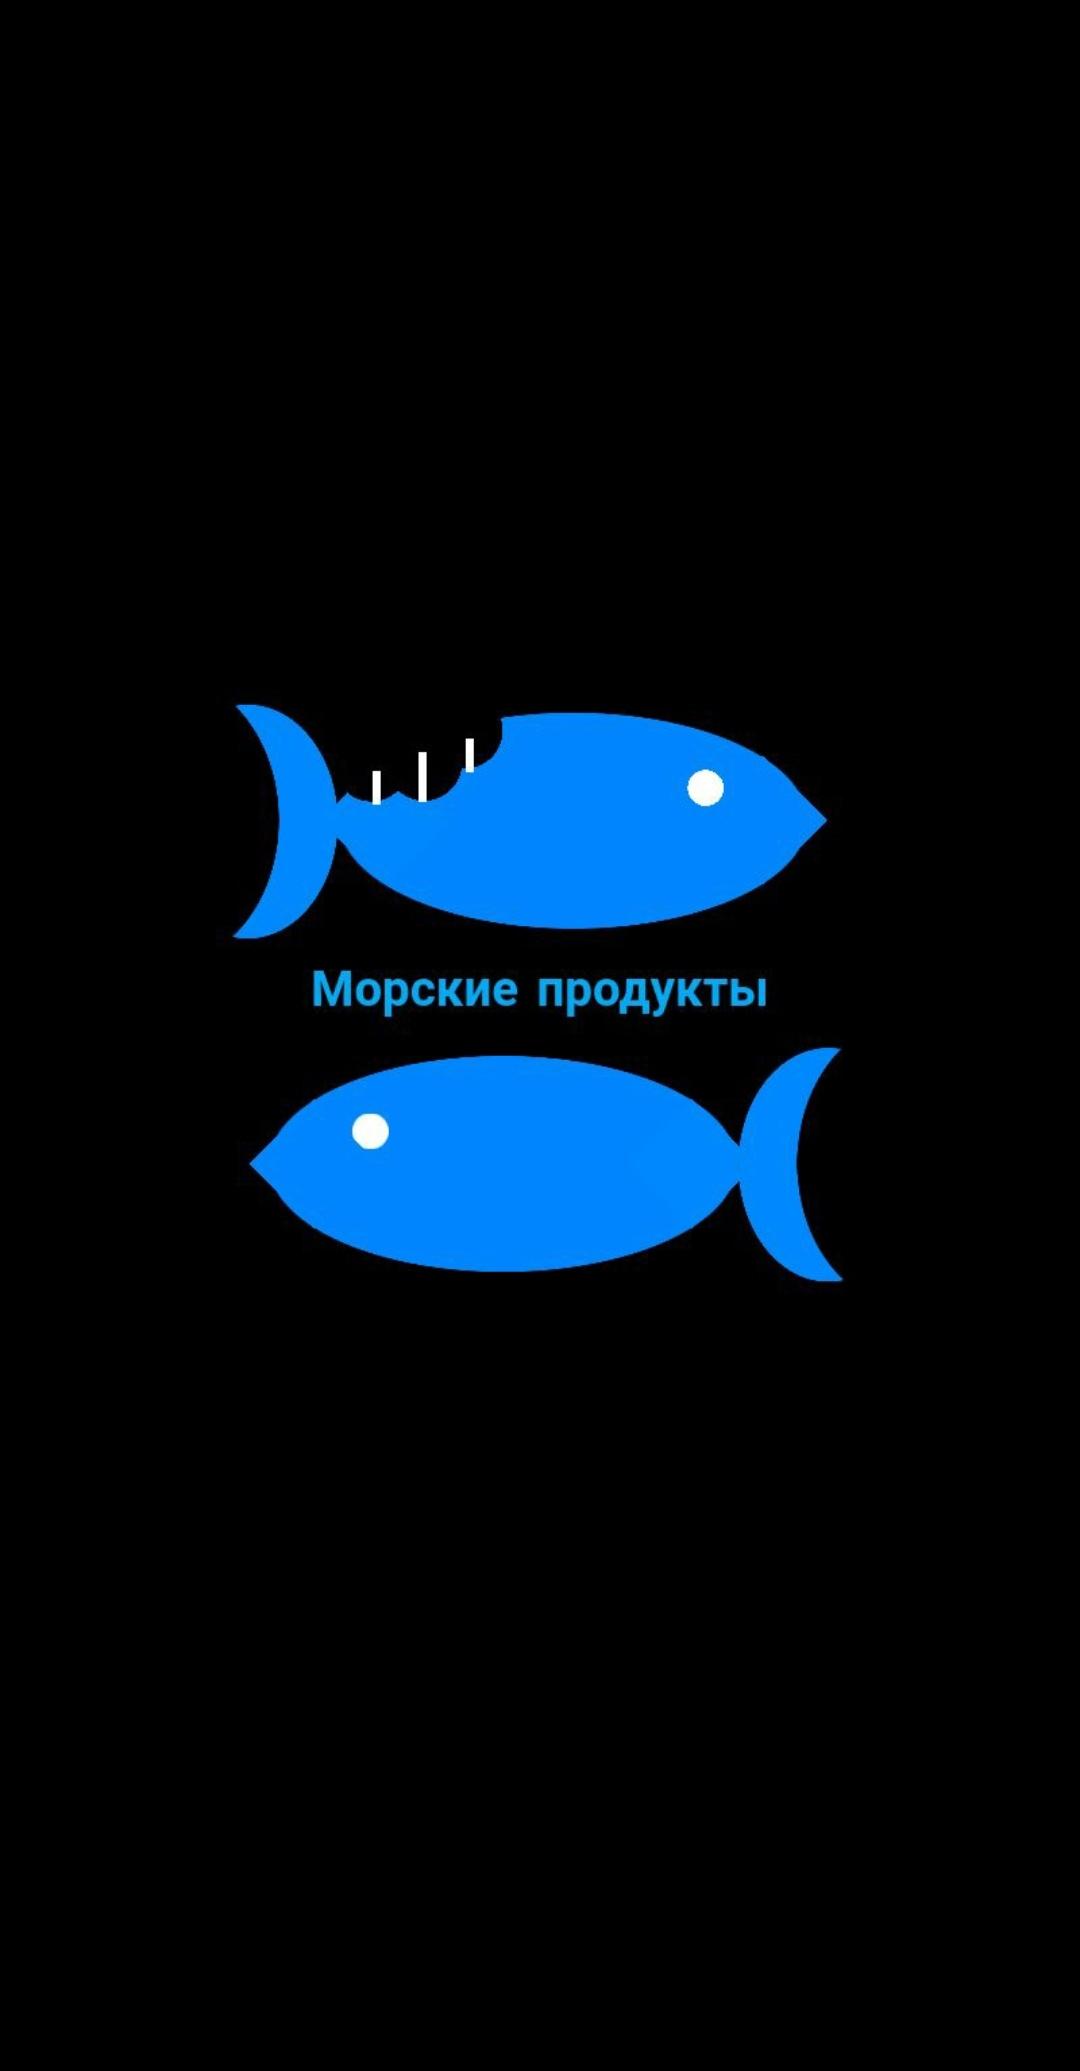 Разработать логотип.  фото f_4215ec6771b8b0fd.jpg